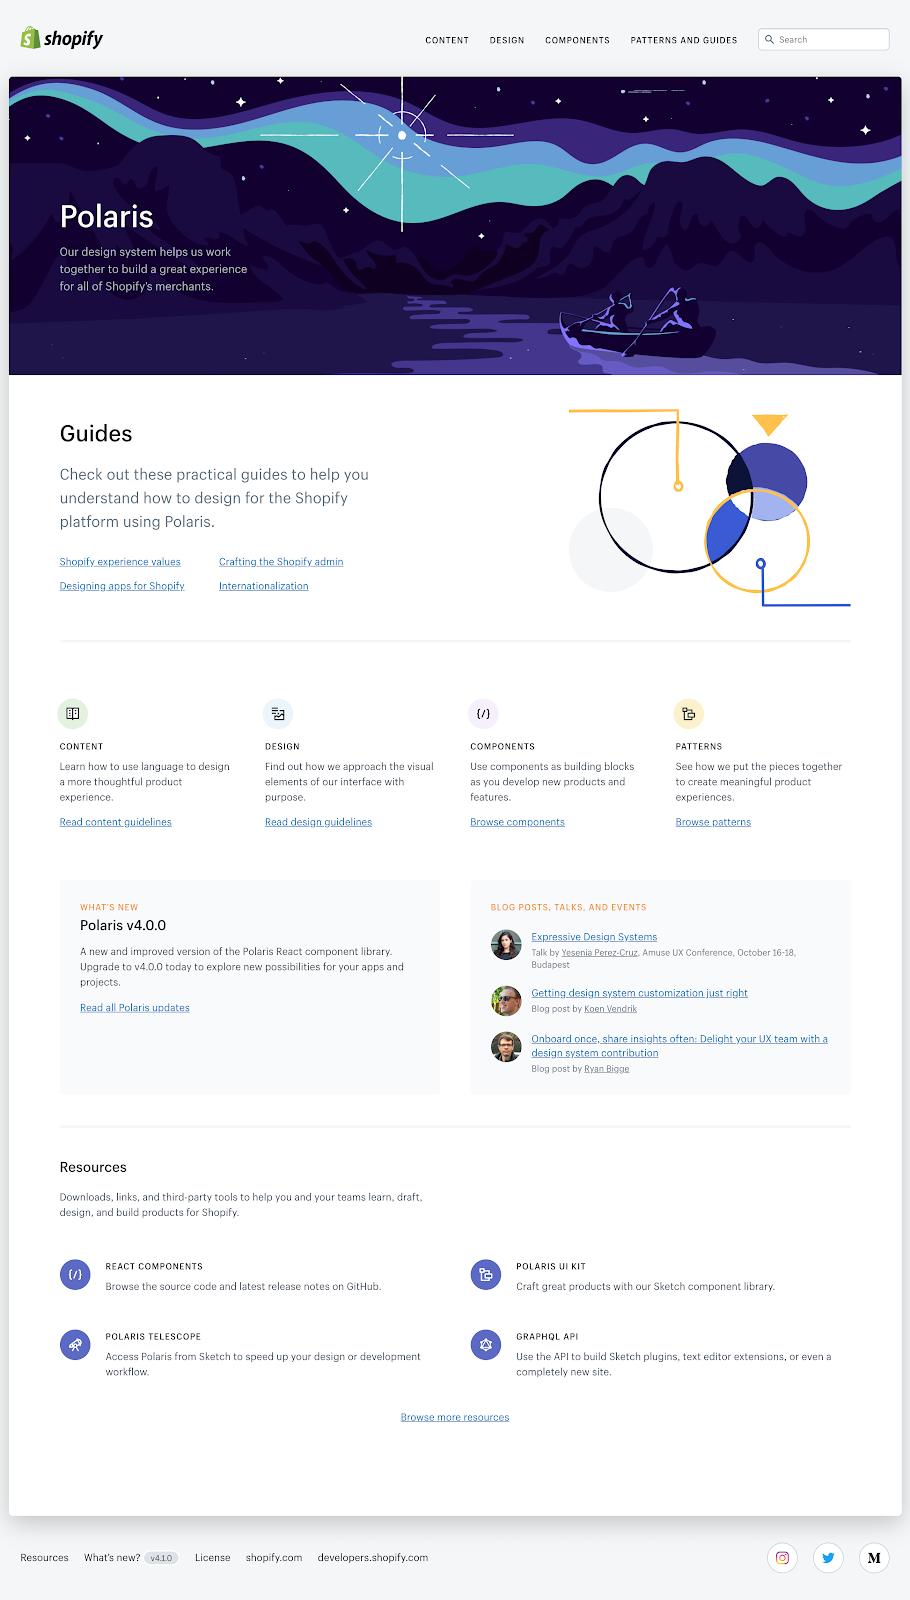 Version 4 of Shopify's Polaris design system online resource hub.